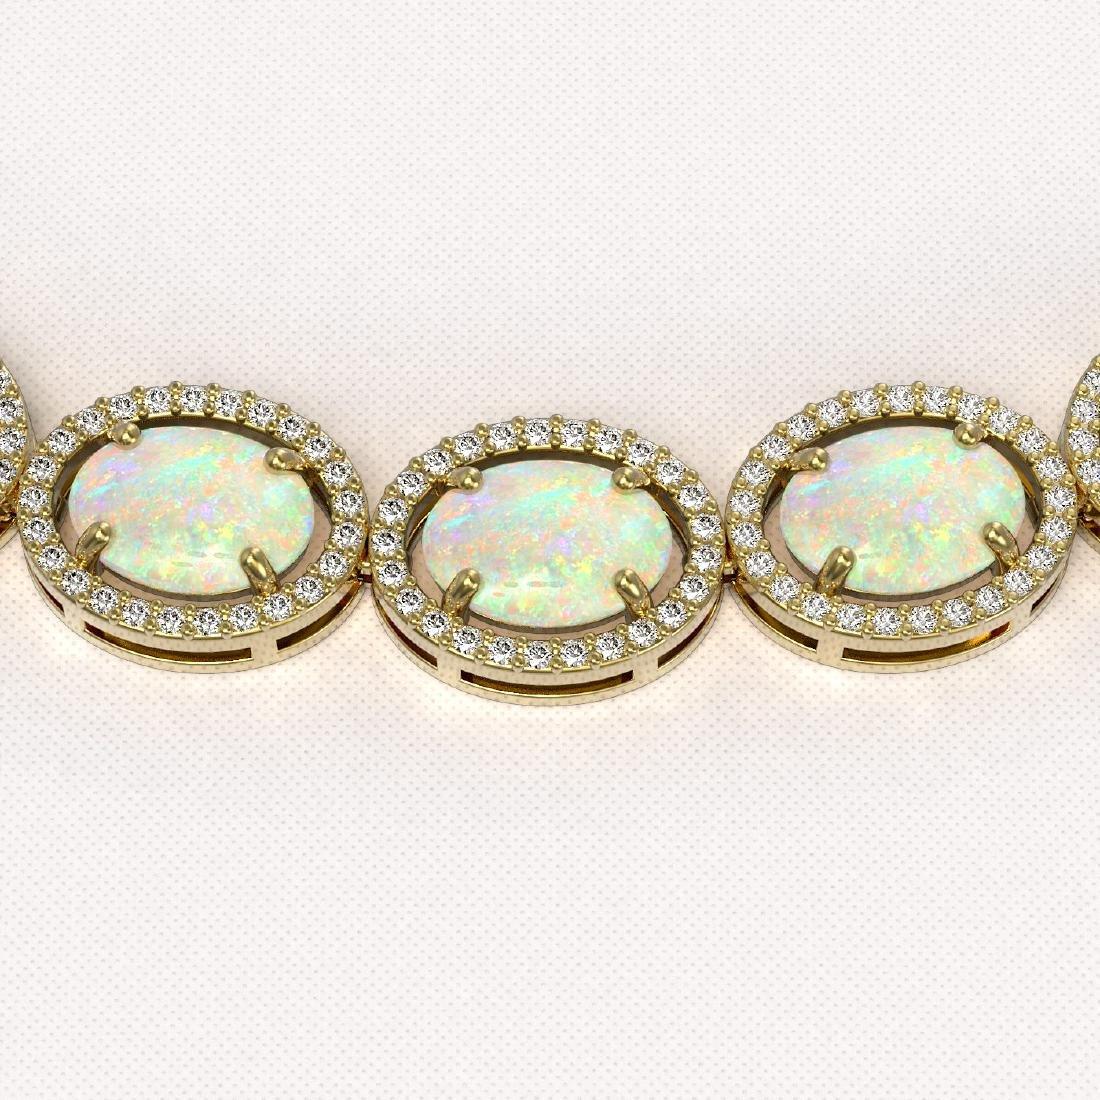 42.29 CTW Opal & Diamond Halo Necklace 10K Yellow Gold - 3